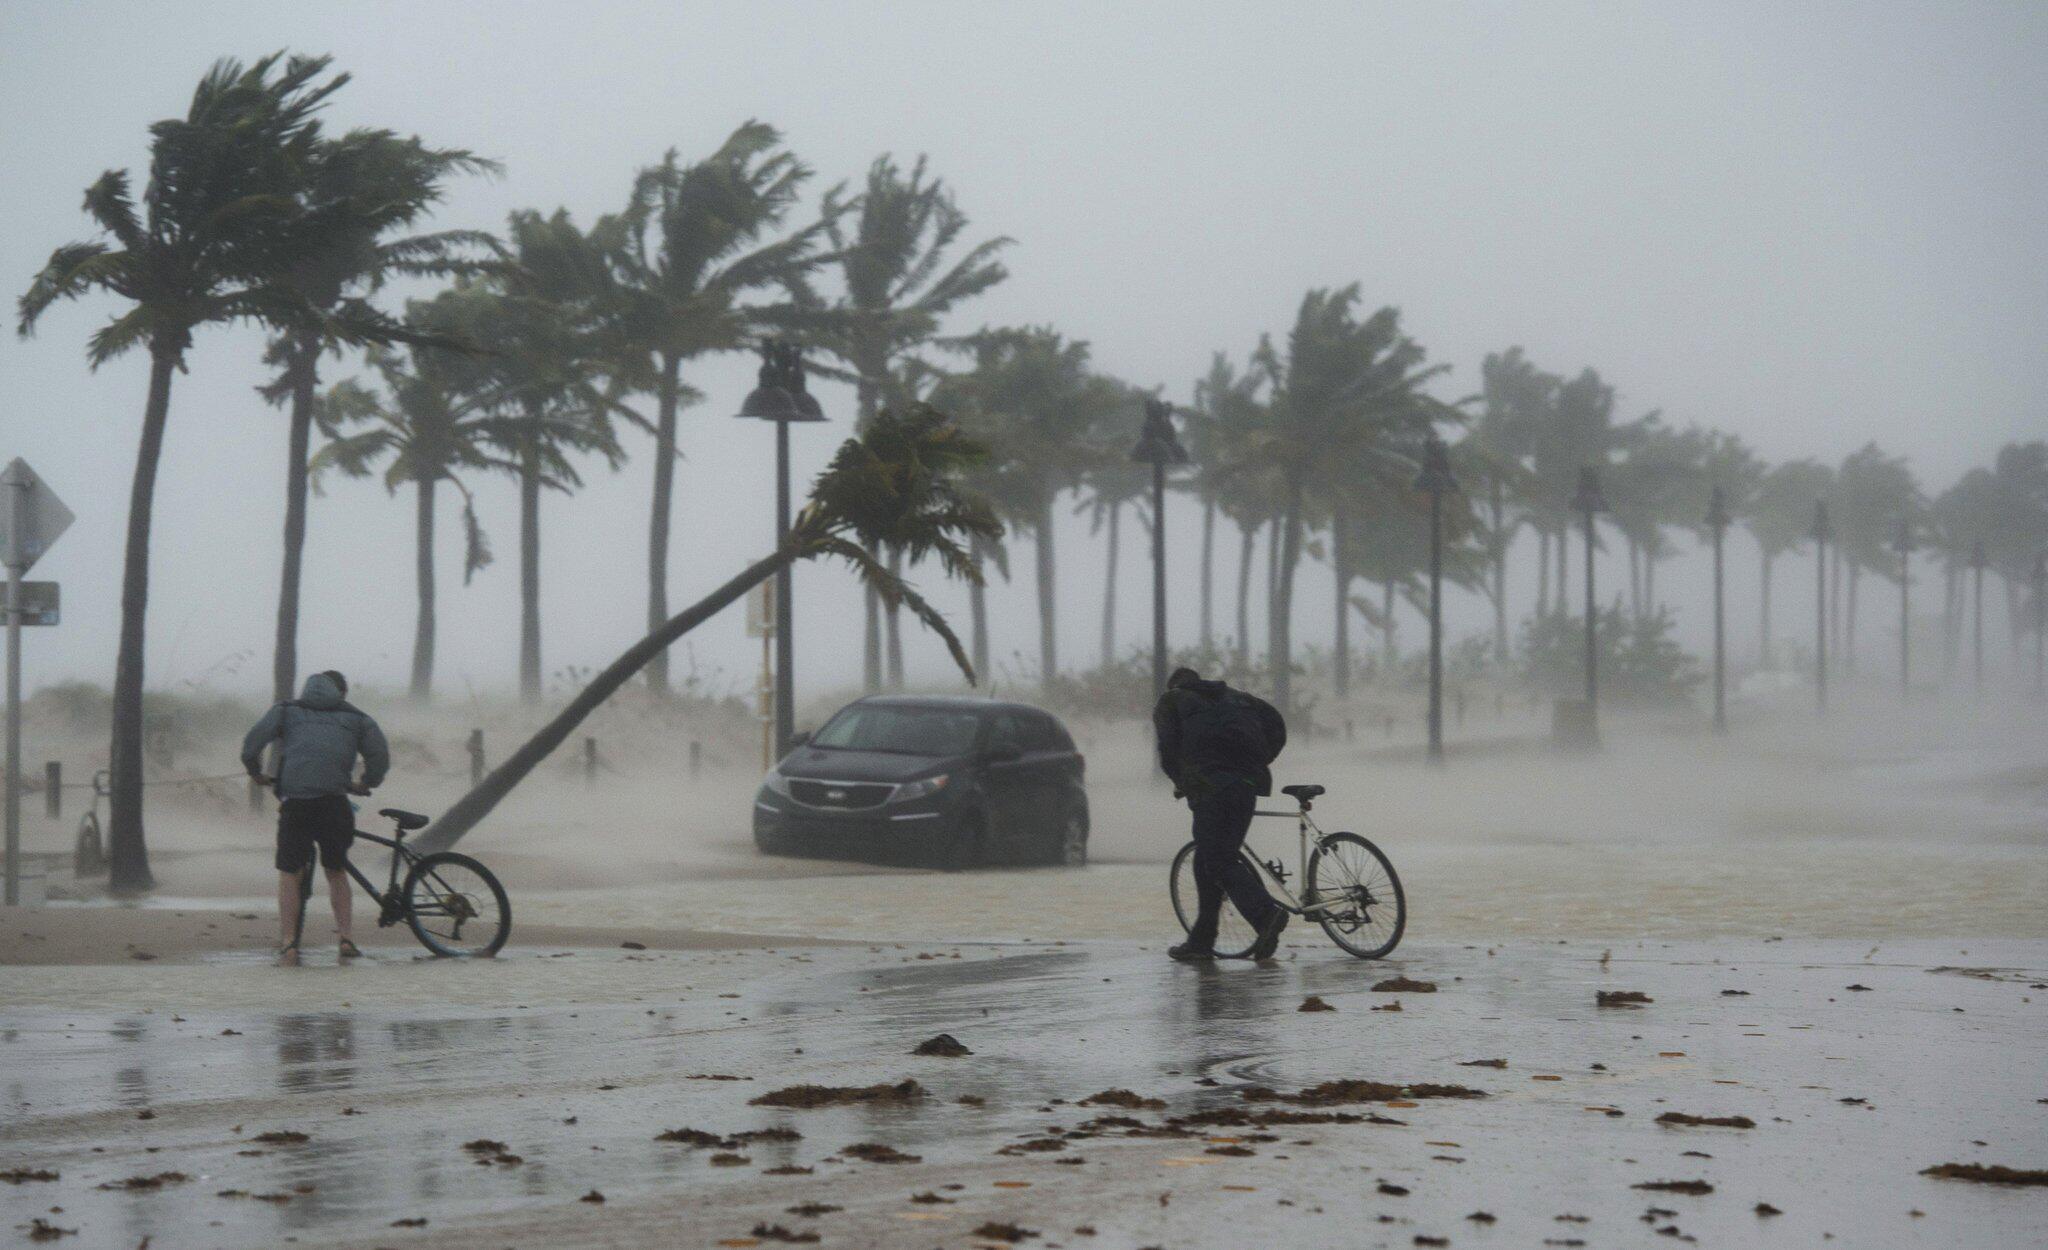 Bild zu Hurrikan Irma